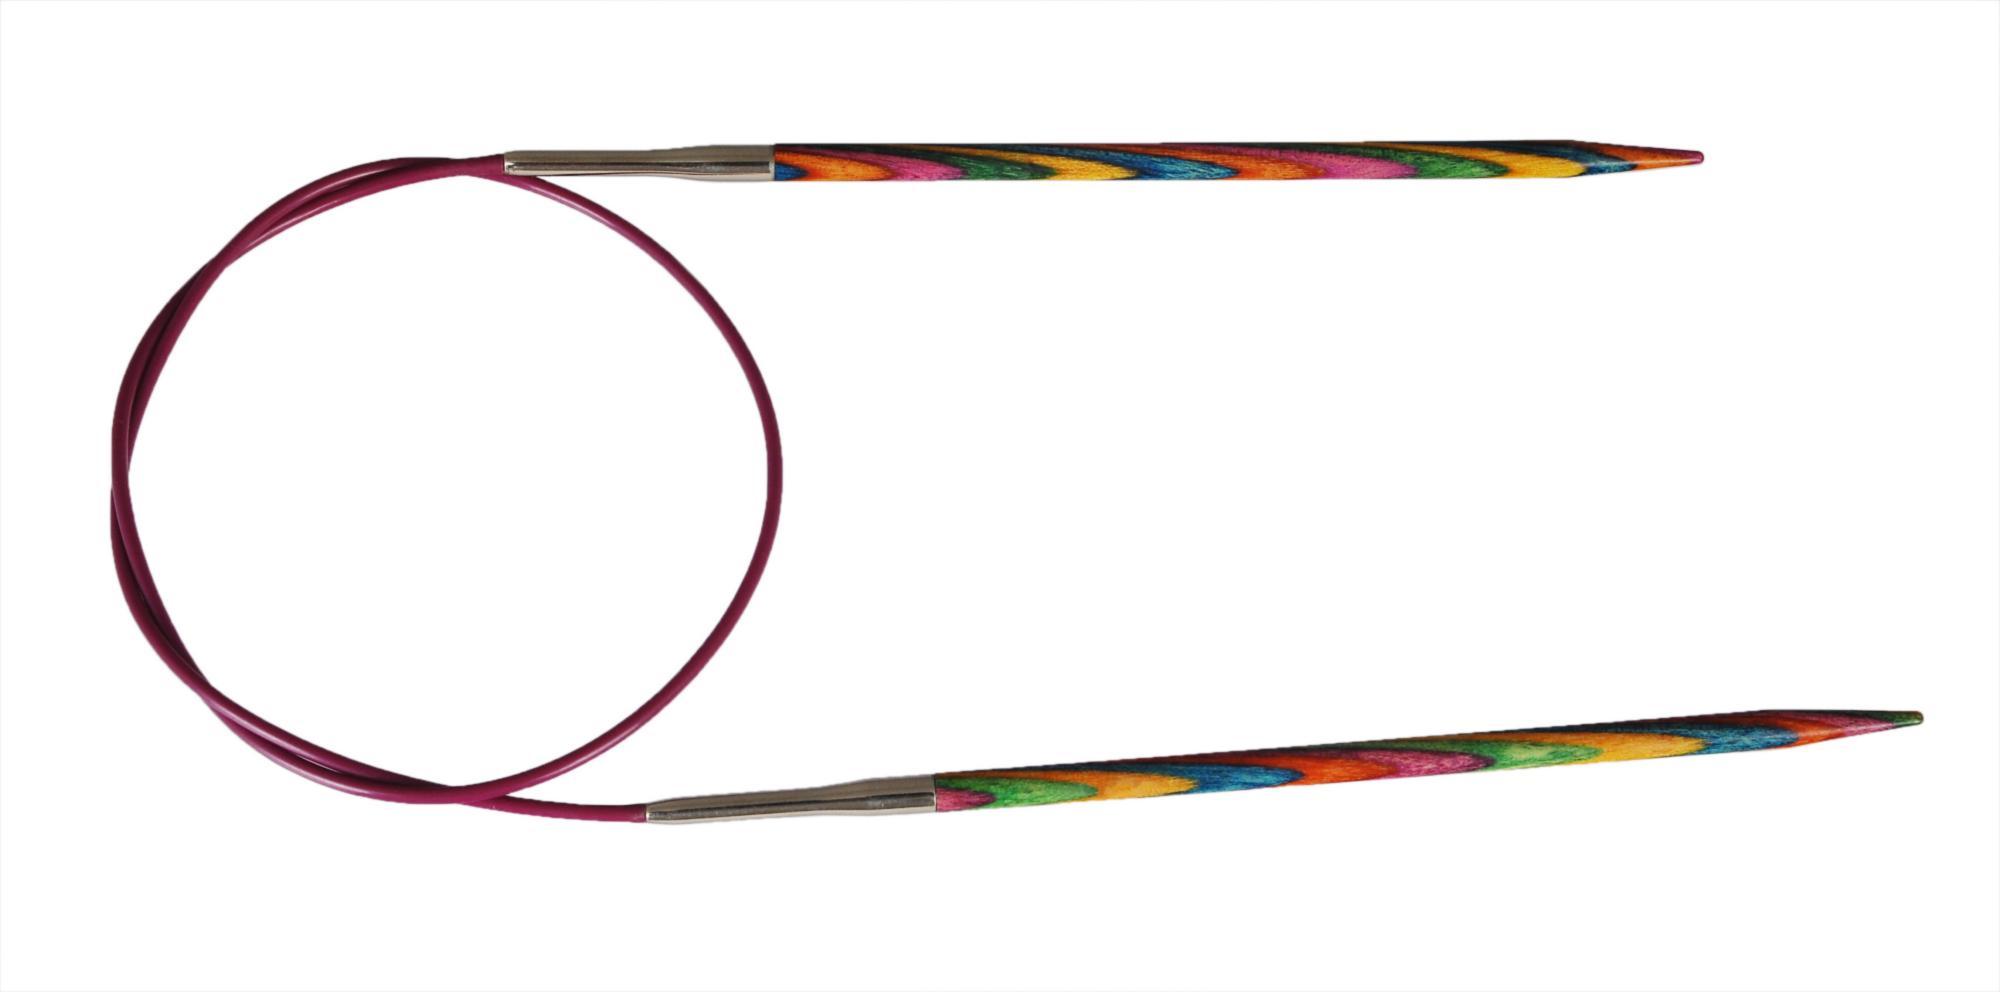 Спицы круговые 150 см Symfonie Wood KnitPro, 21381, 3.75 мм